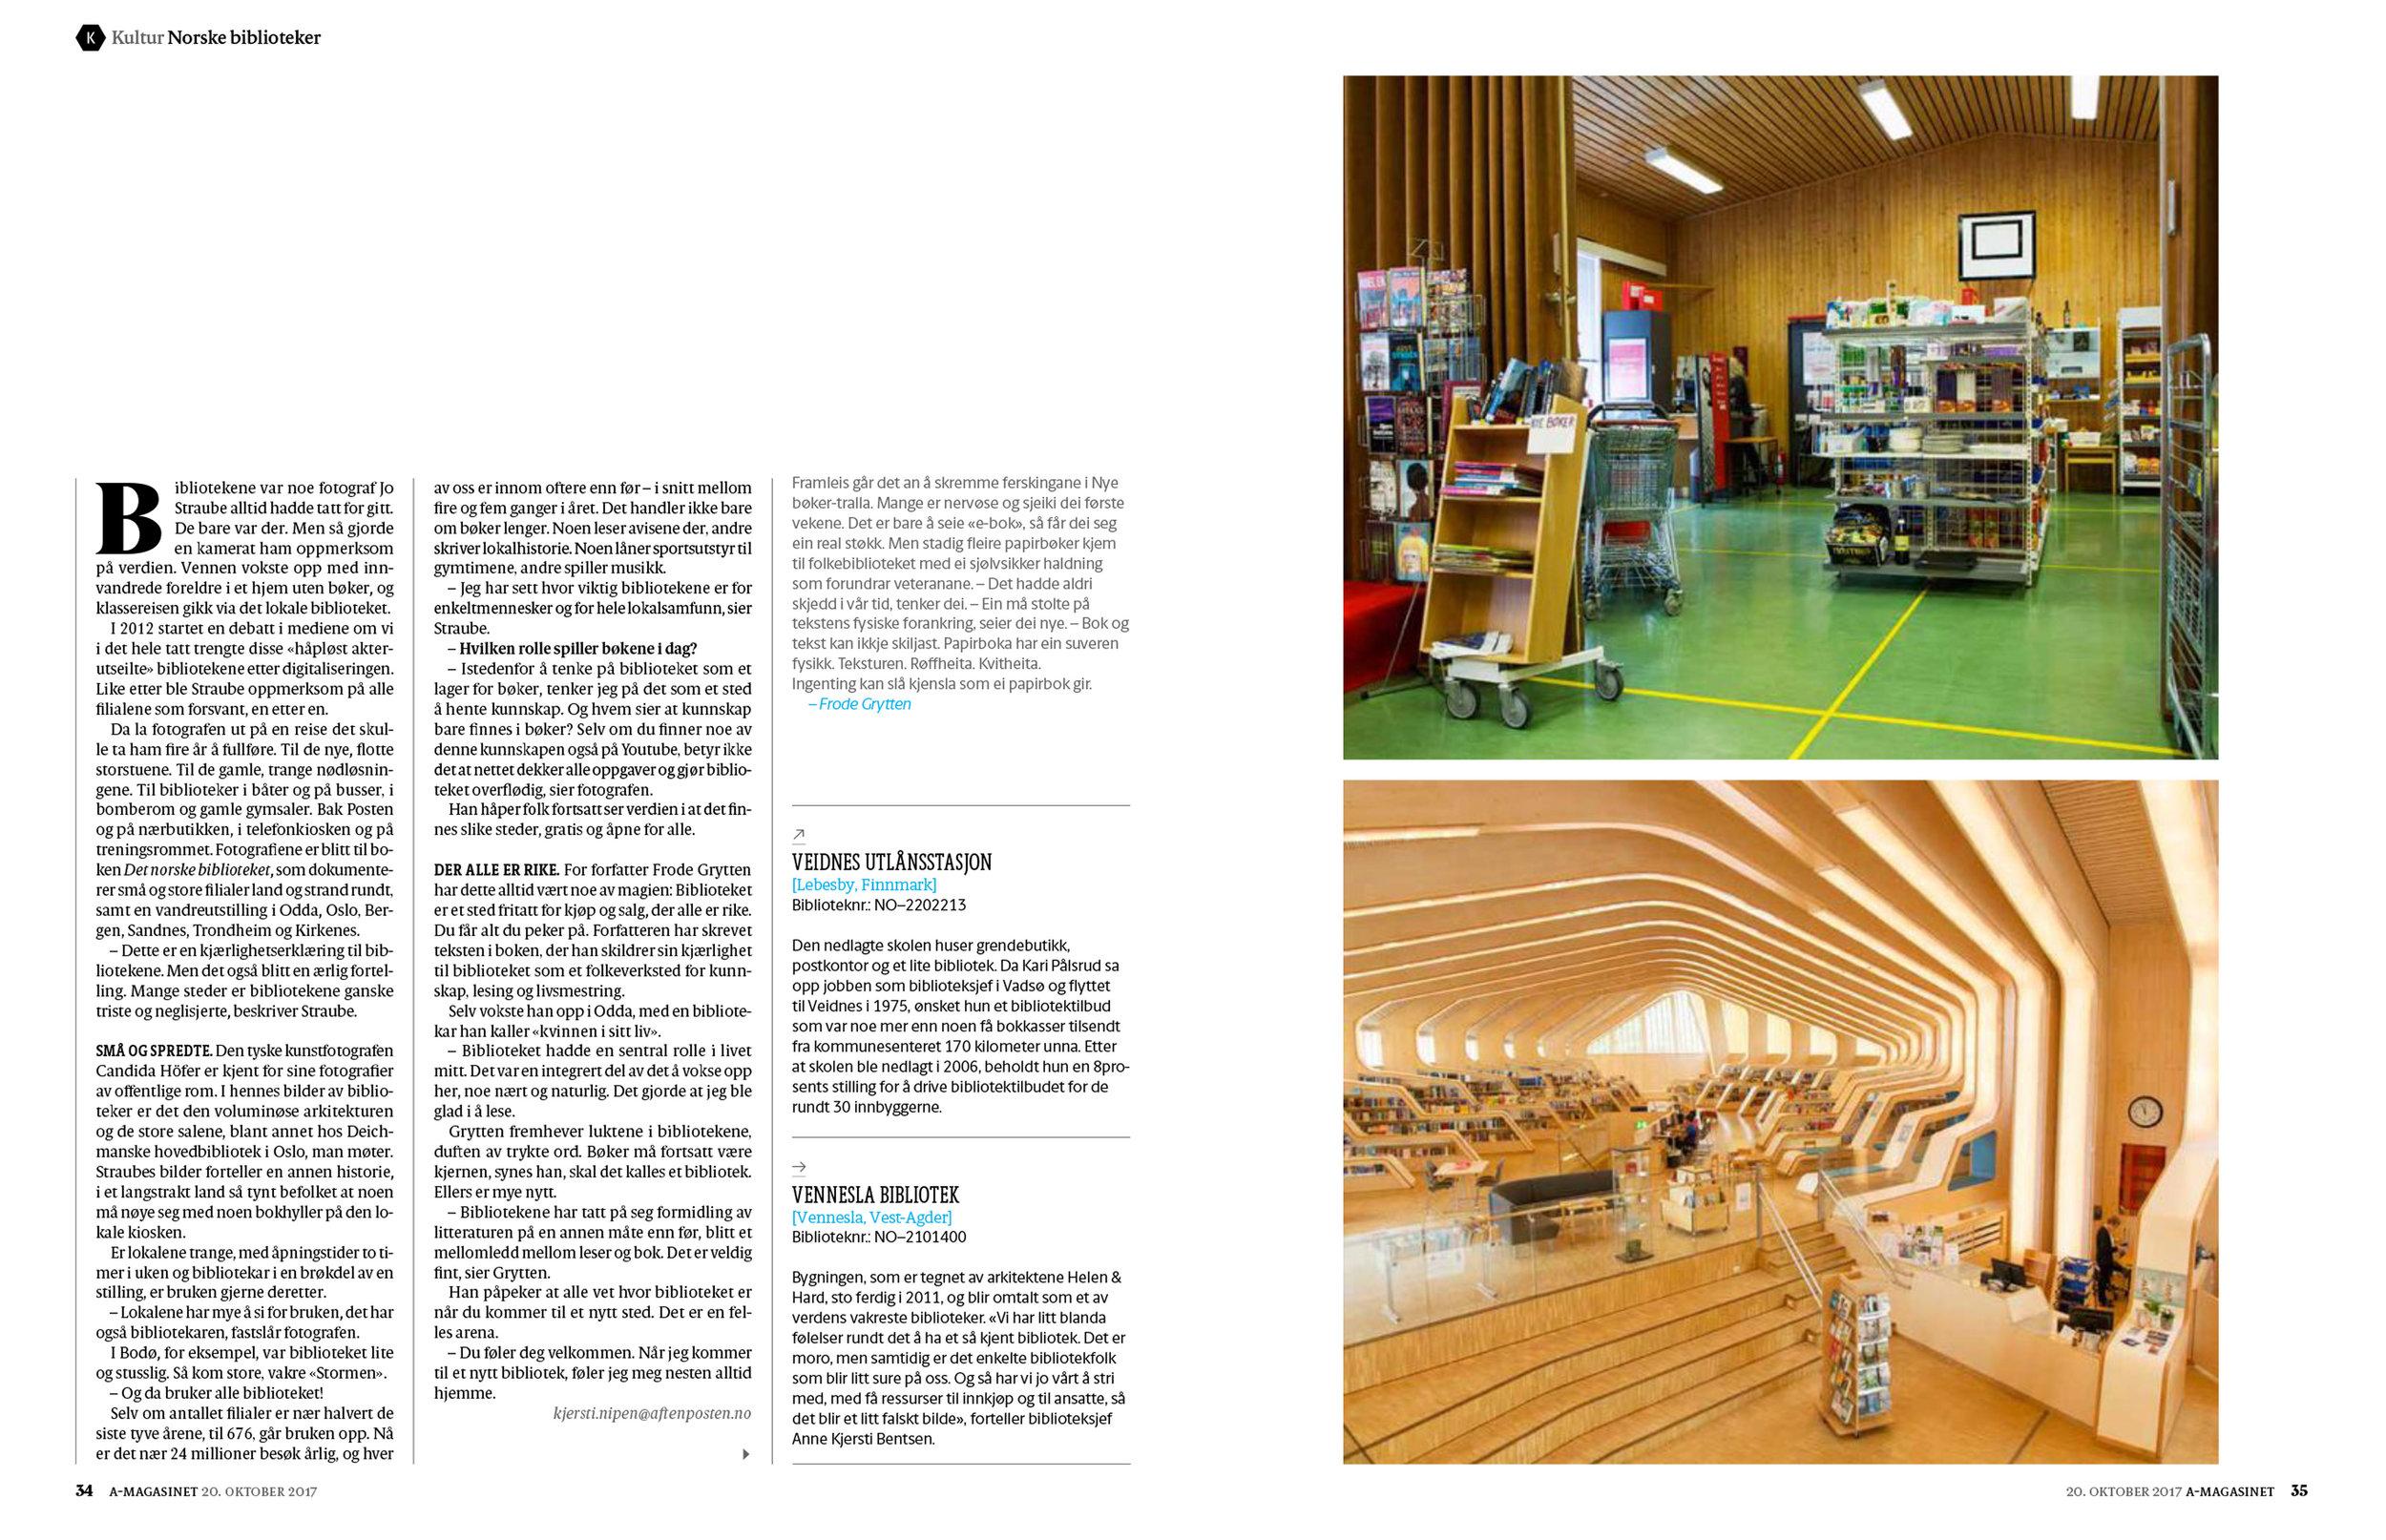 2017-10-20 a-magasinet_34.jpg